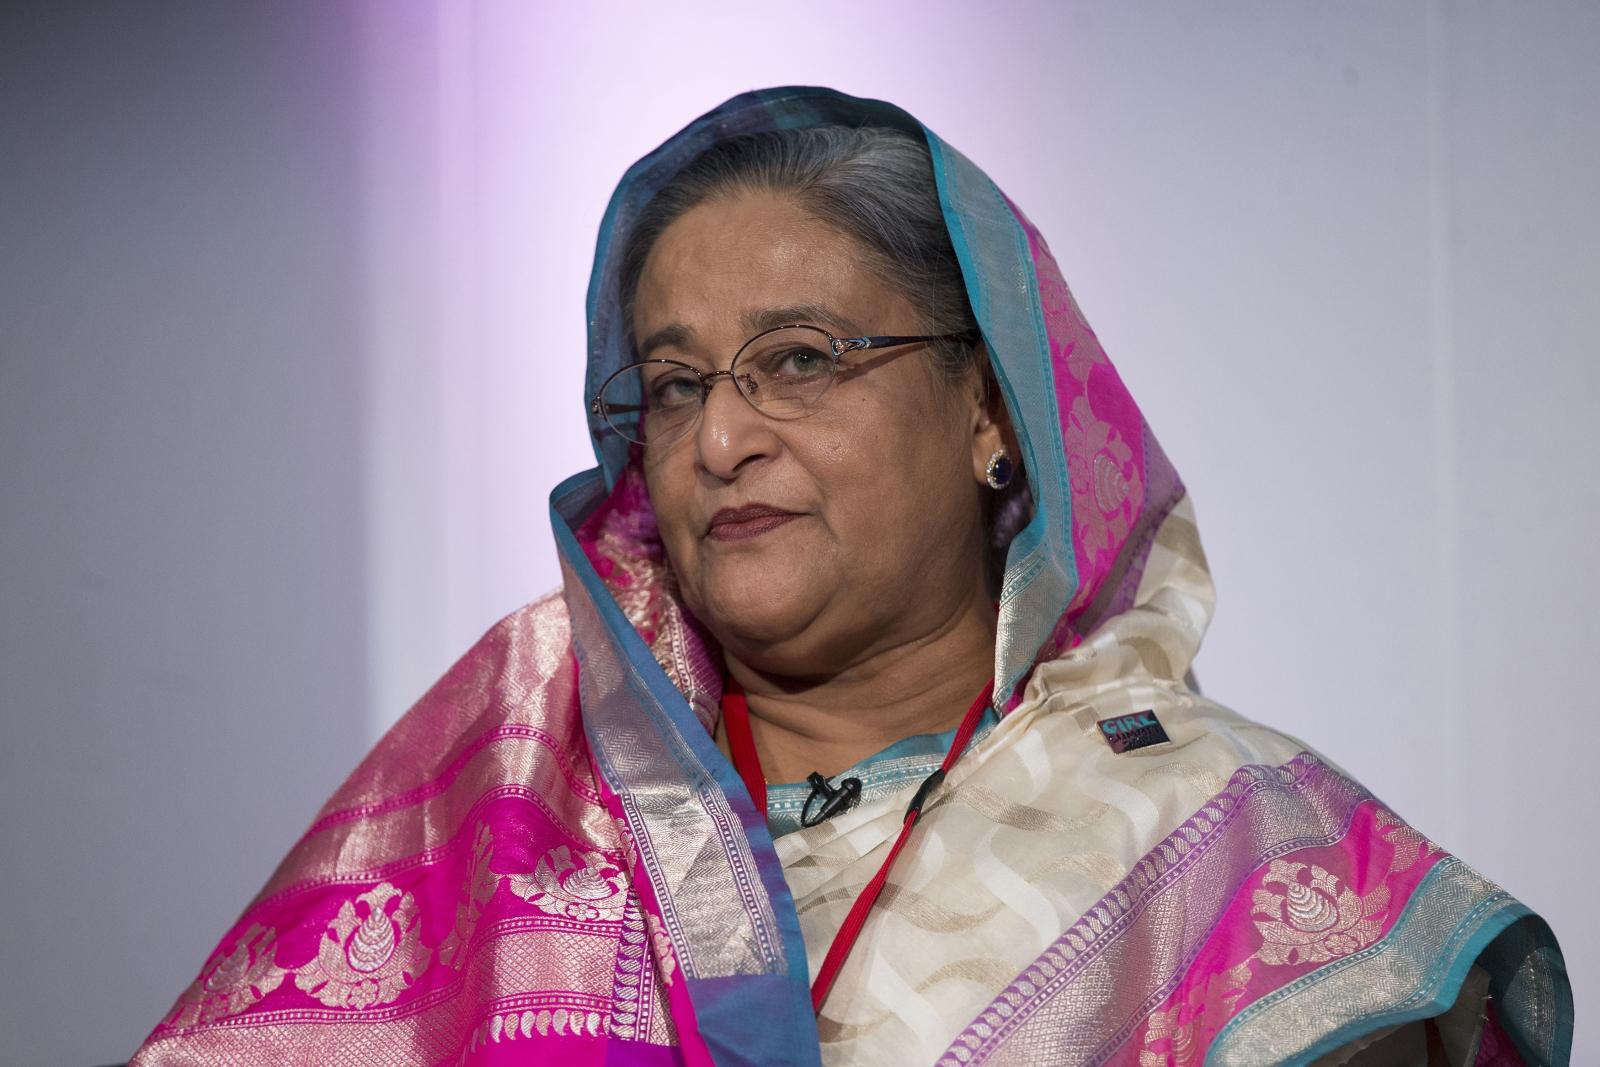 Indian intelligence foils suspected terror plot to assassinate Bangladesh Prime Minister Sheikh Hasina